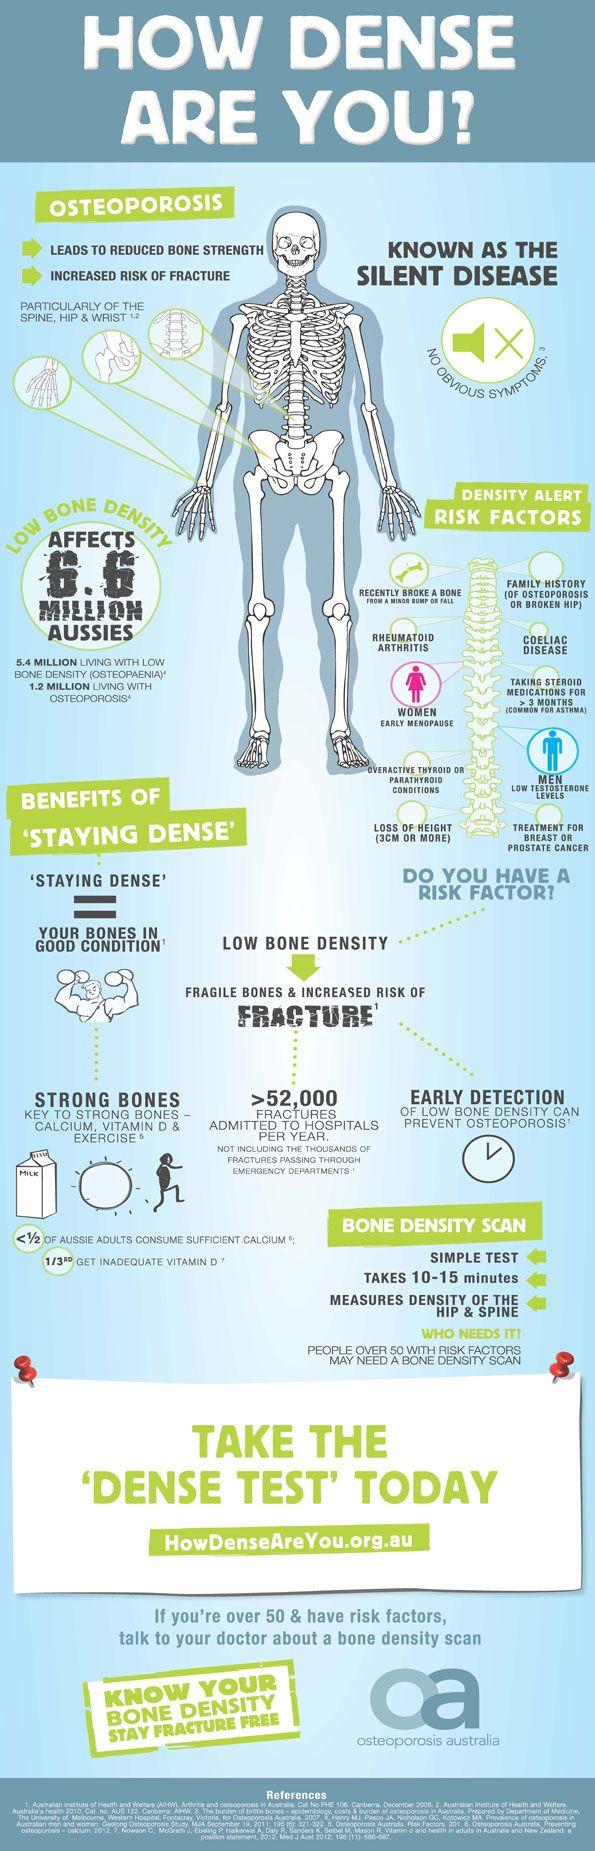 35+ Is osteoporosis a metabolic disease ideas